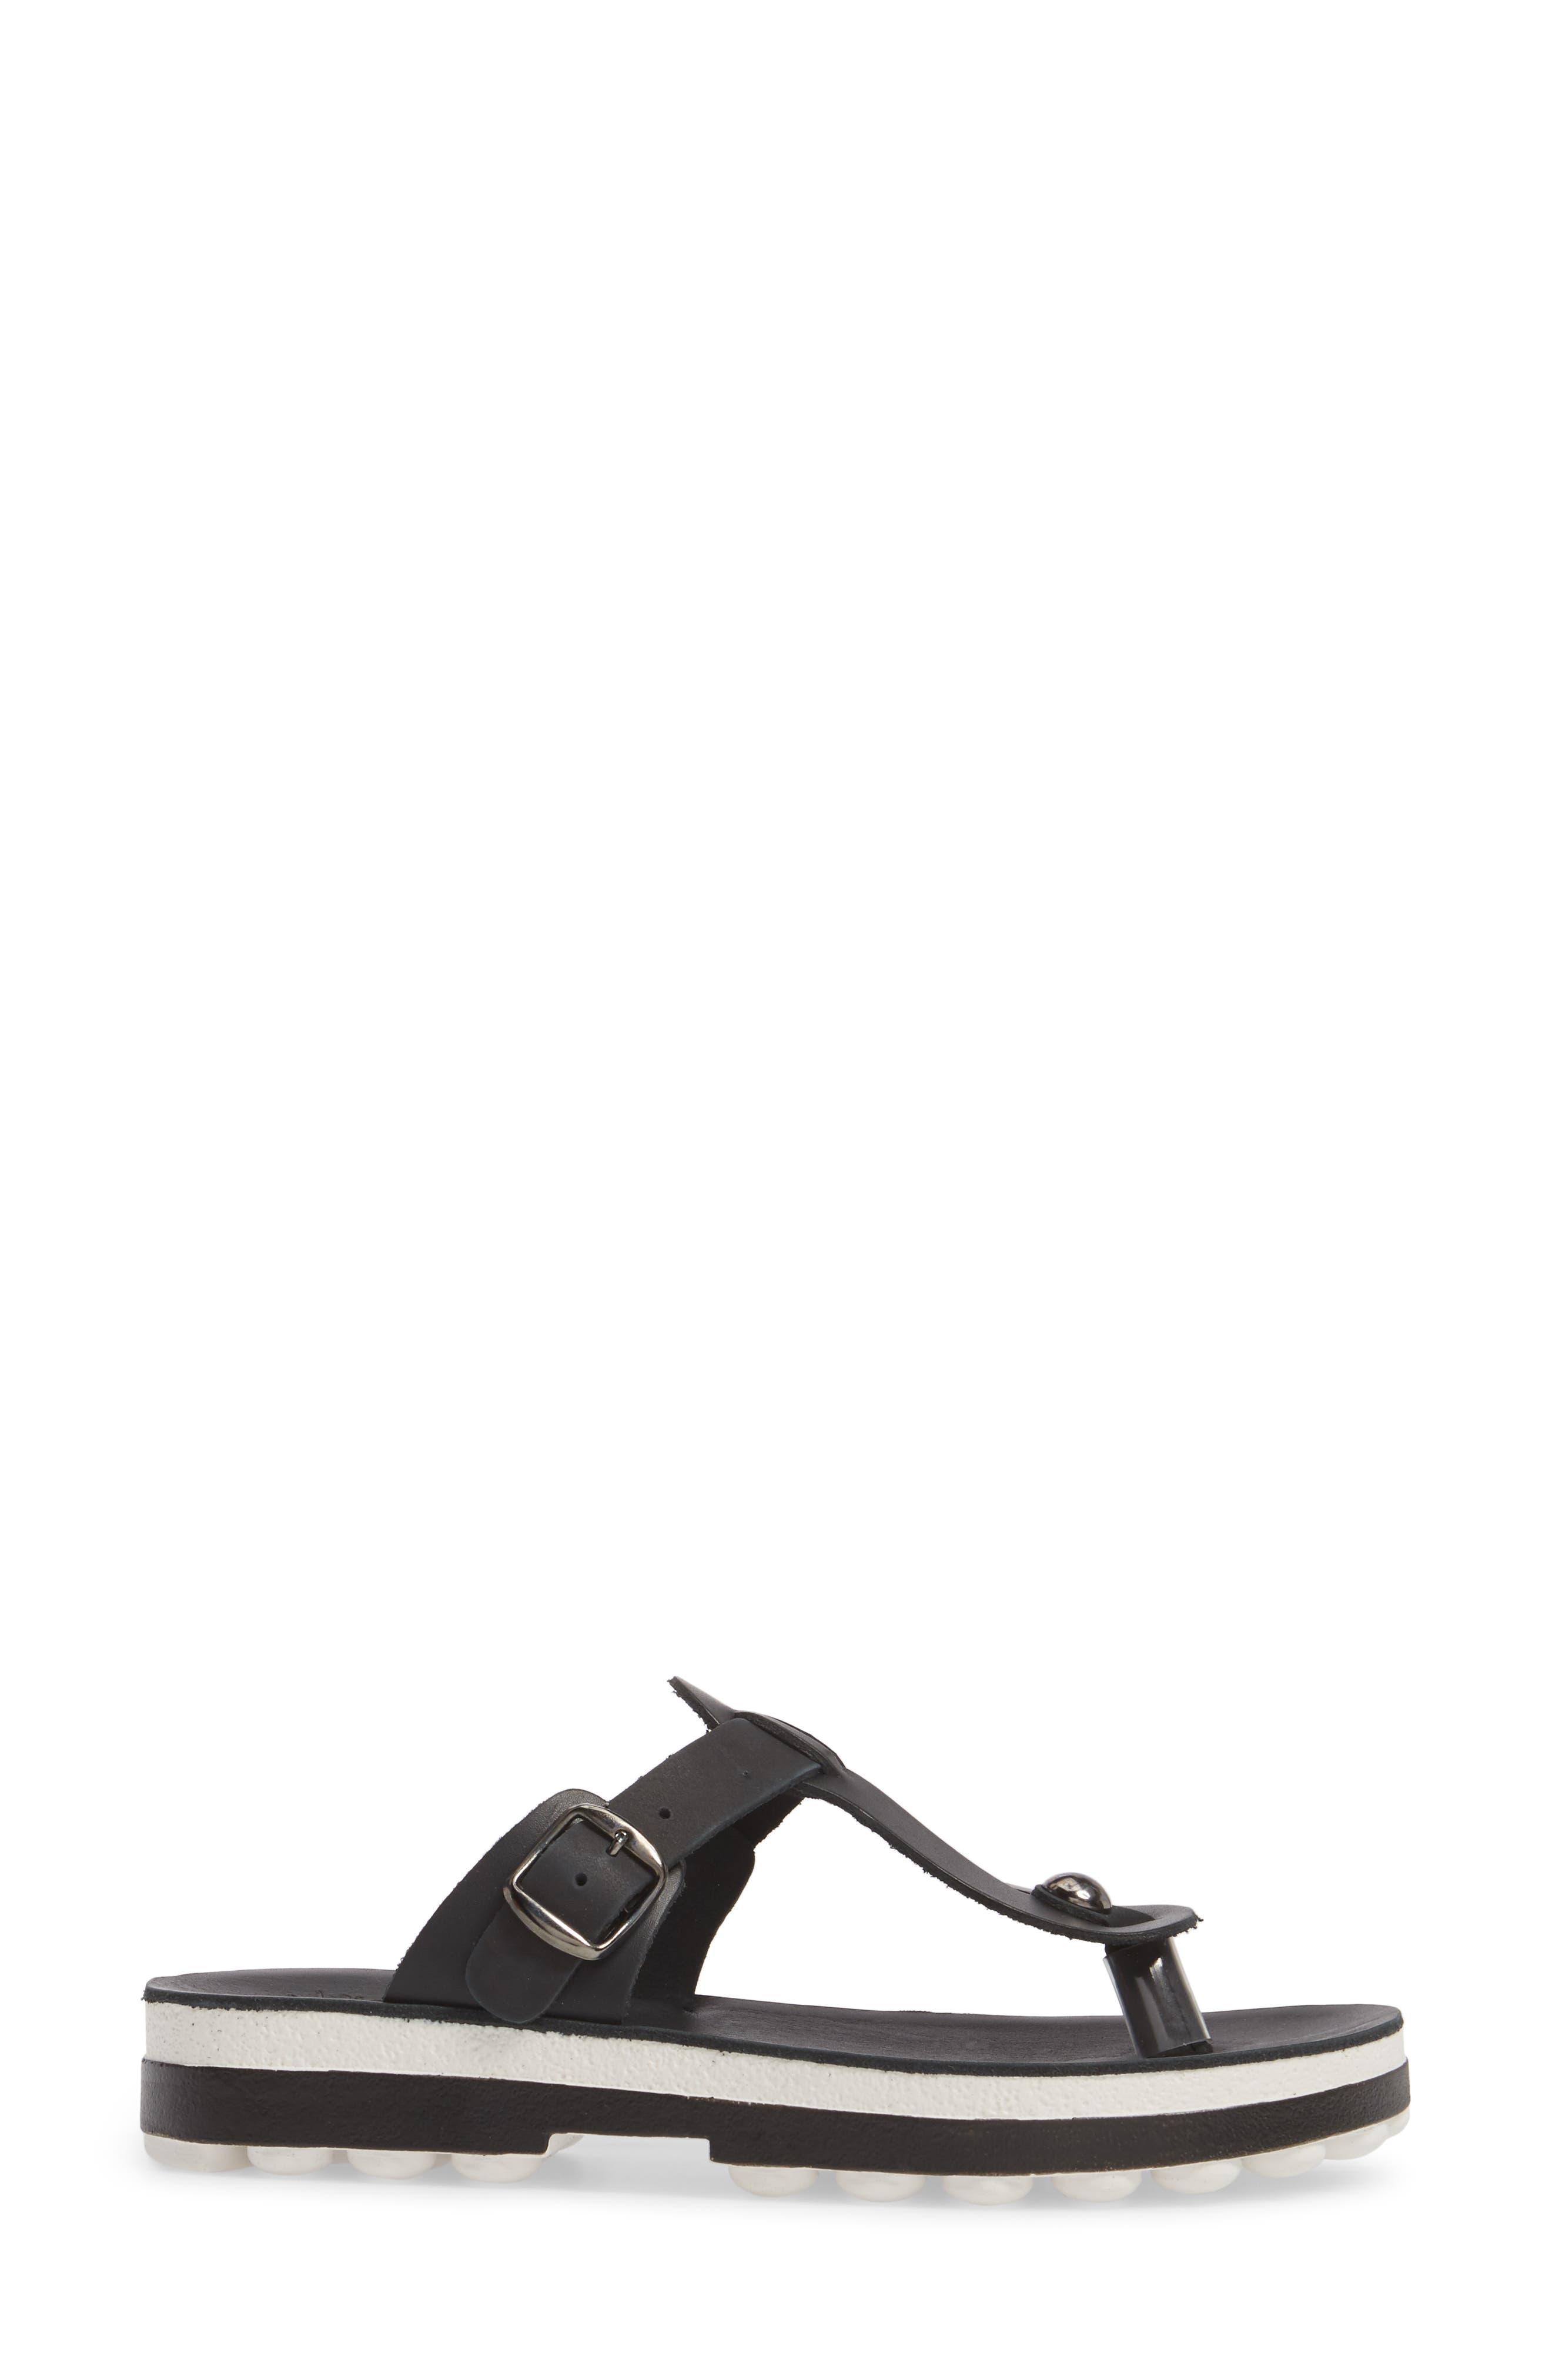 Alternate Image 3  - Fantasy Sandals Mirabella Fantasy Sandal (Women)